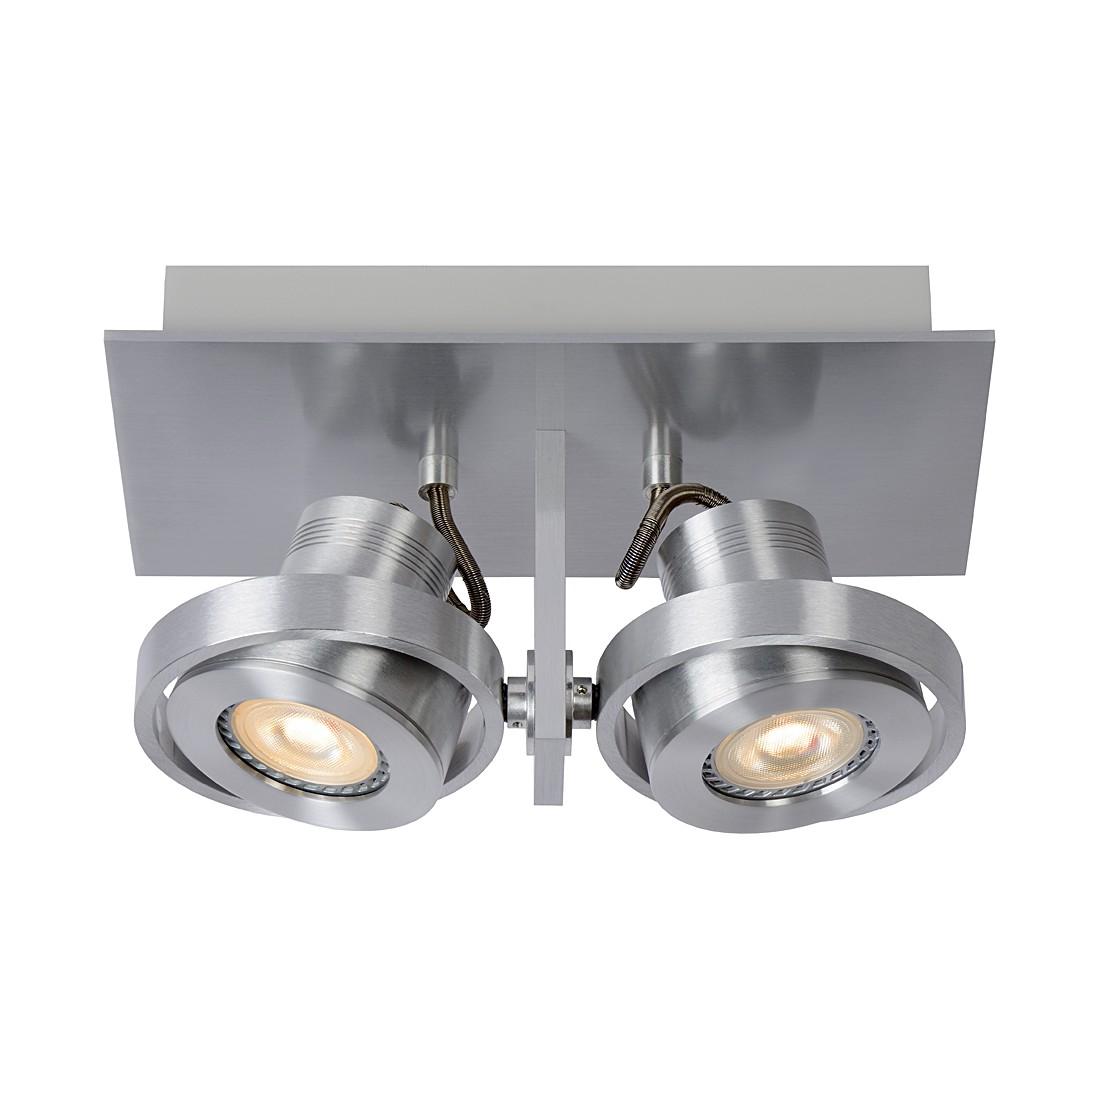 Deckenstrahler LUCI-2 LED – Aluminium – 2-flammig, Zuiver günstig